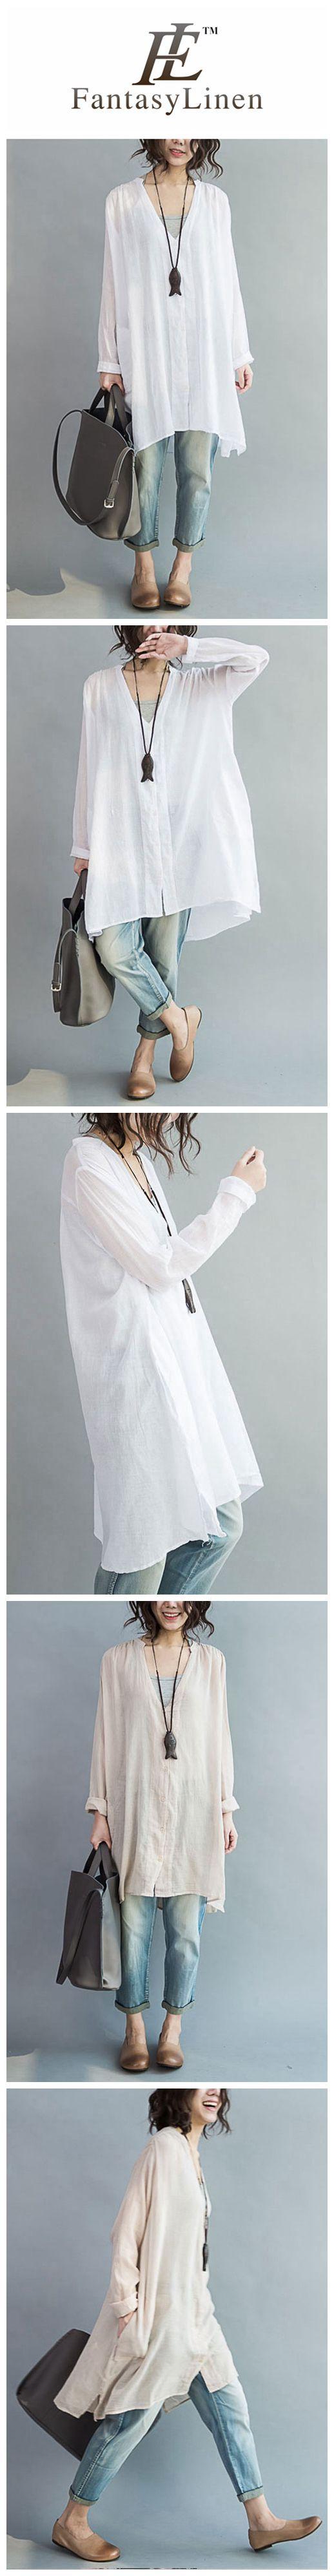 Art Casual Loose Long V-neck Cotton Shirt Women Clothes